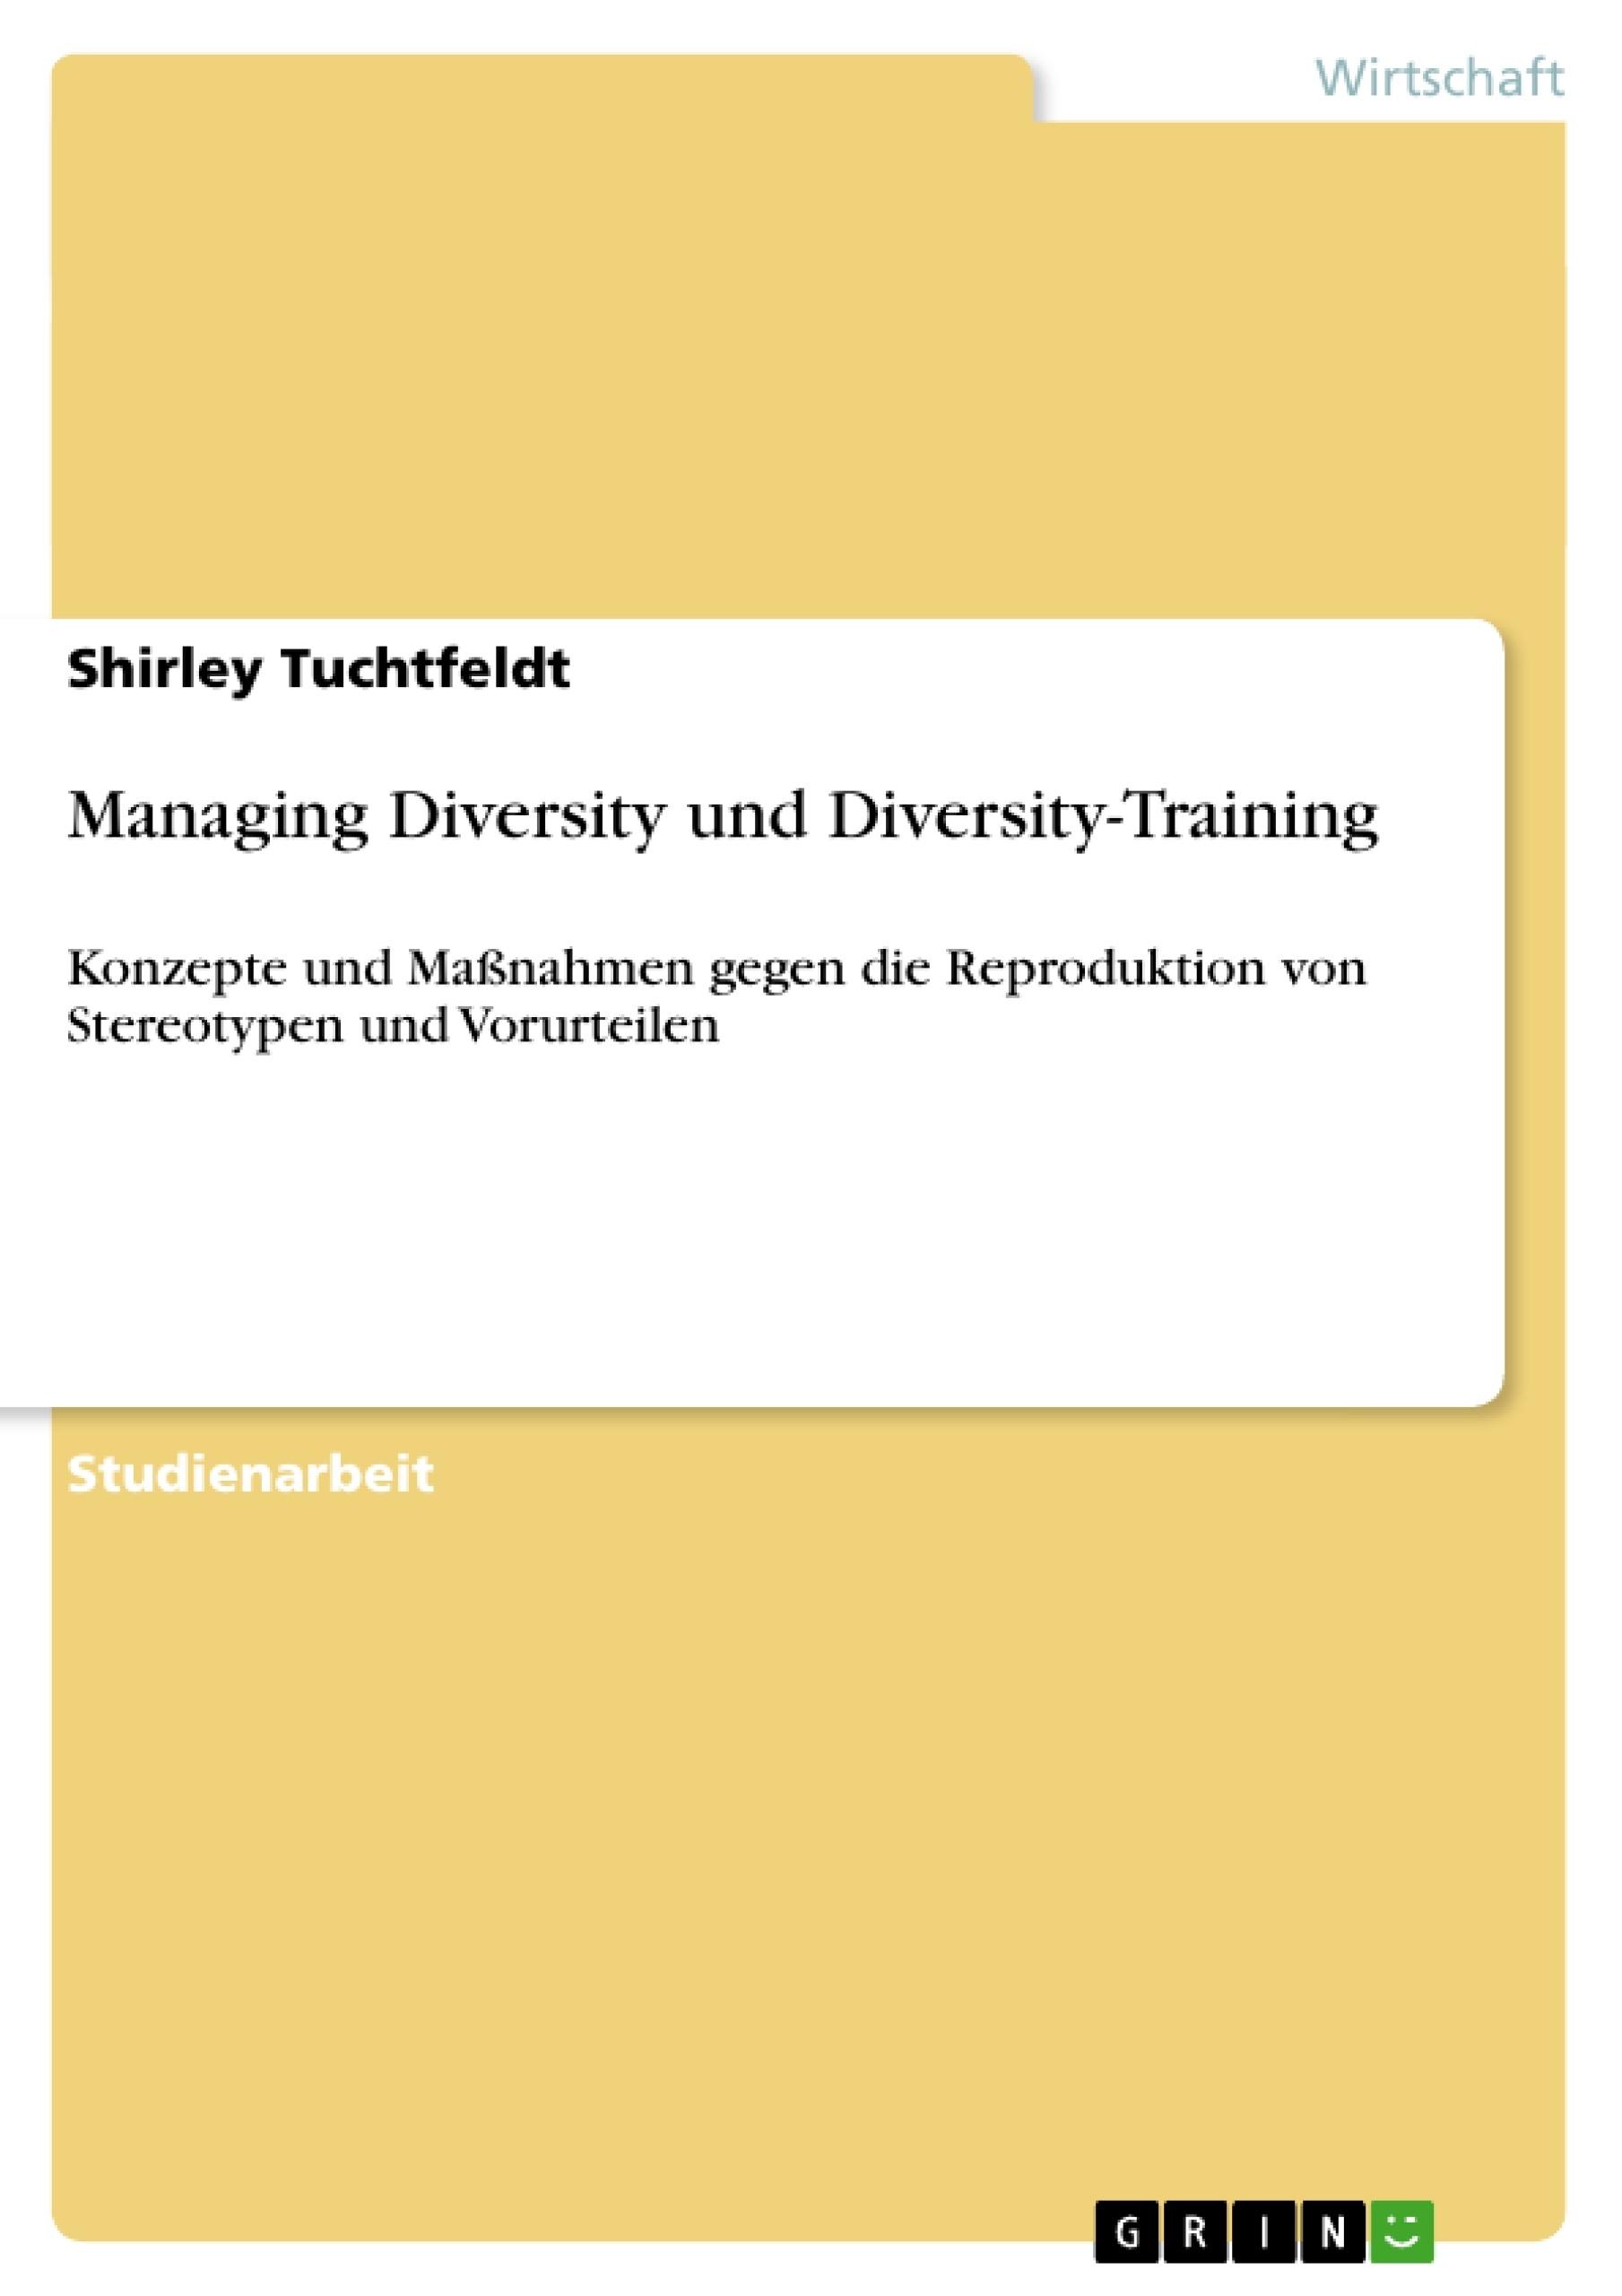 Titel: Managing Diversity und Diversity-Training